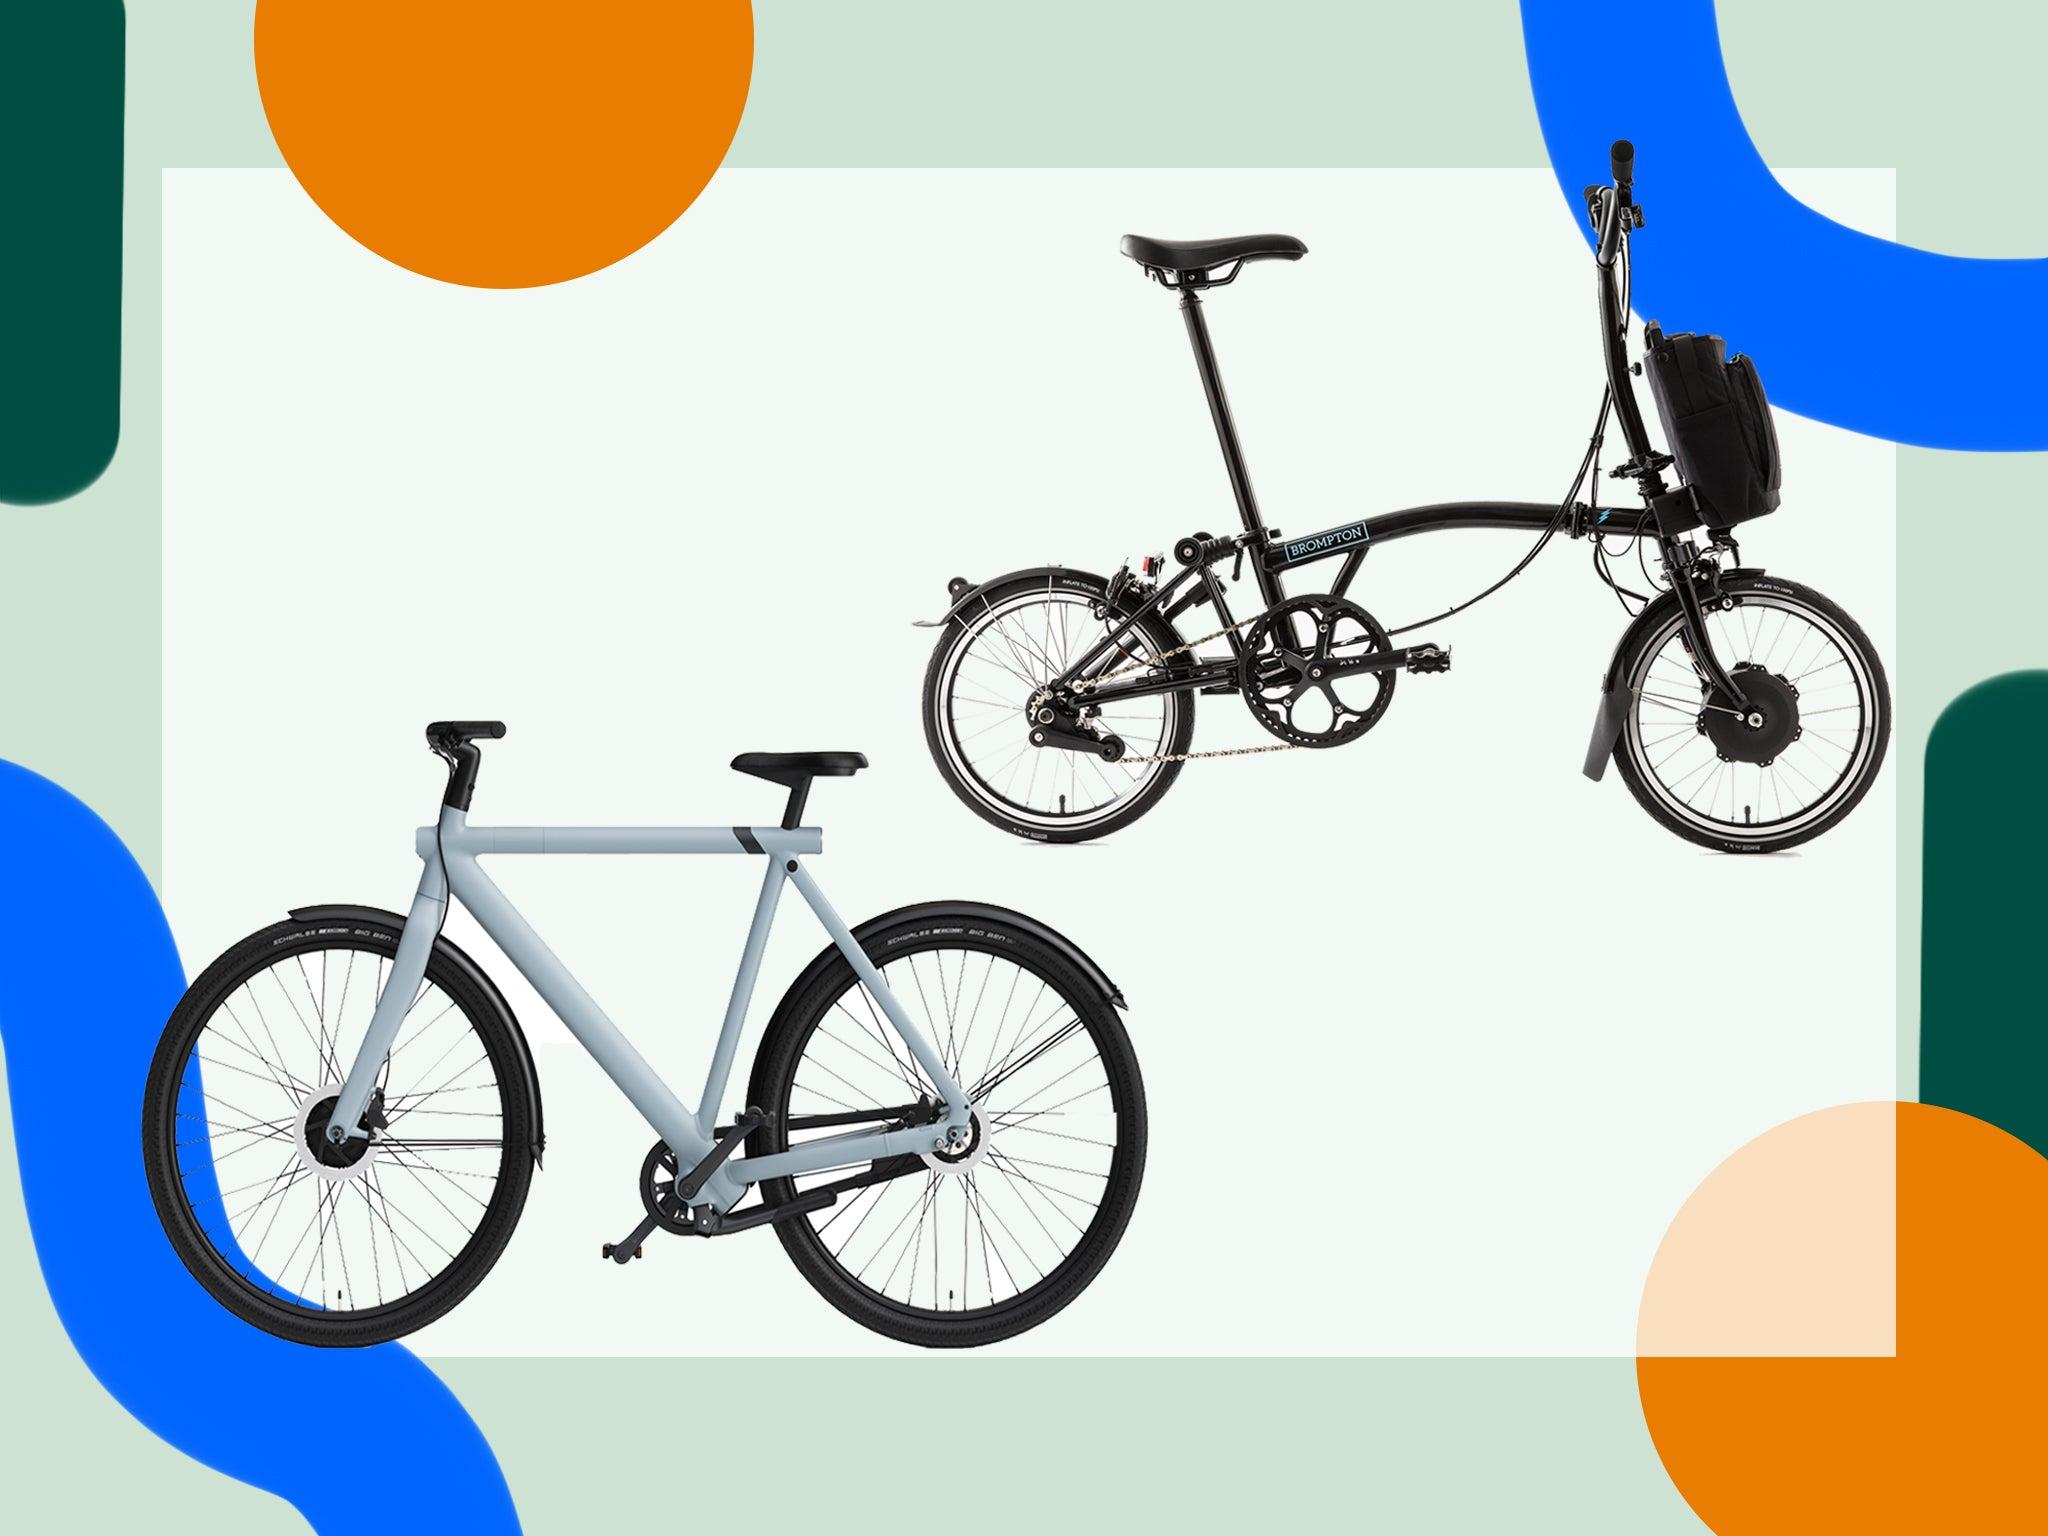 Best electric bike 2020: Hybrid, folding and affordable models